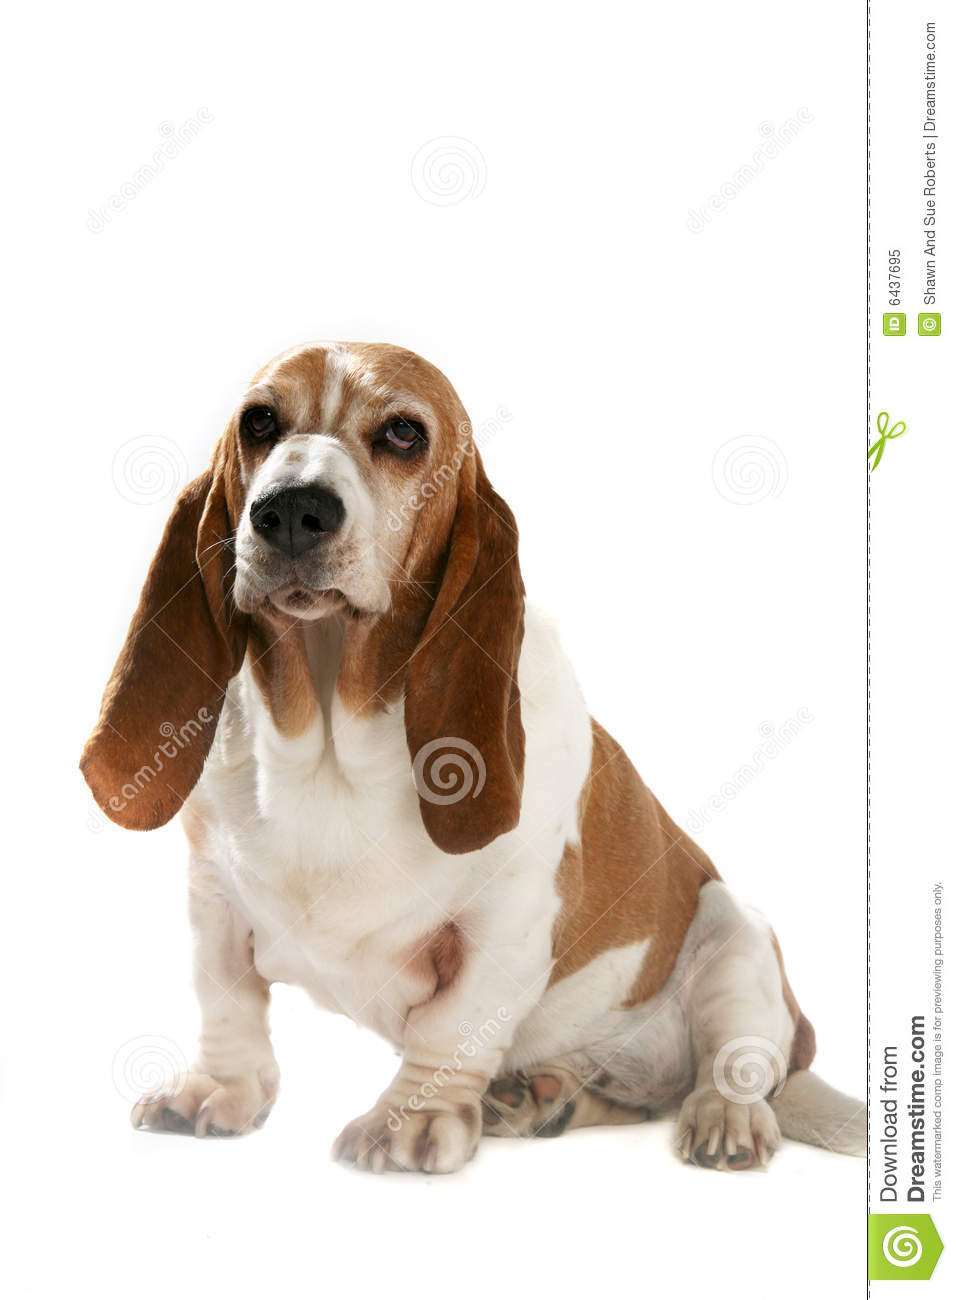 Dog with big ear clipart jpg stock Dog clipart short ears - ClipartFest jpg stock